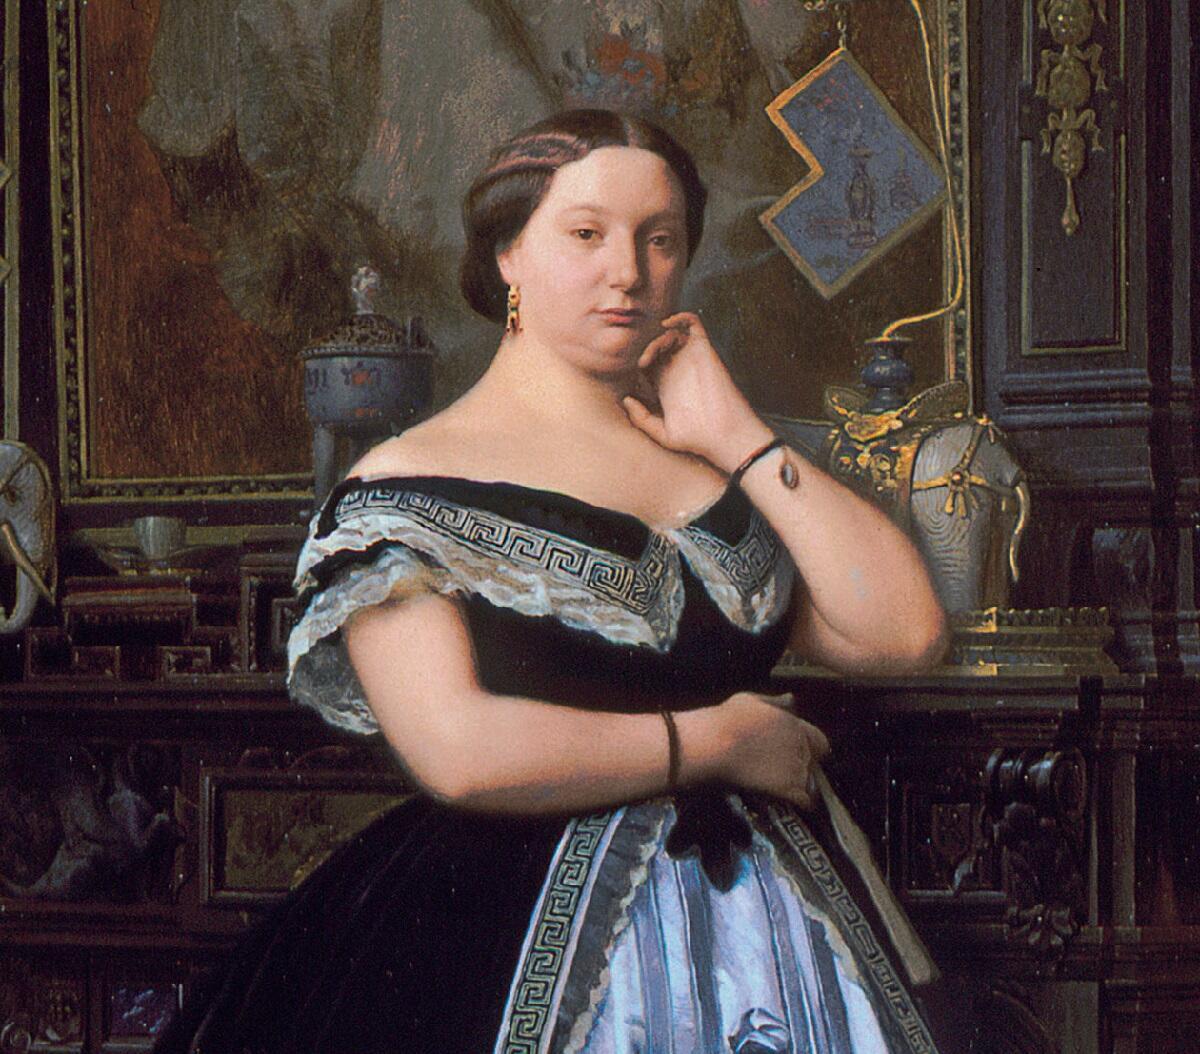 Жан-Леон Жером, портрет баронессы Шарлотты Ротшильд, фрагмент